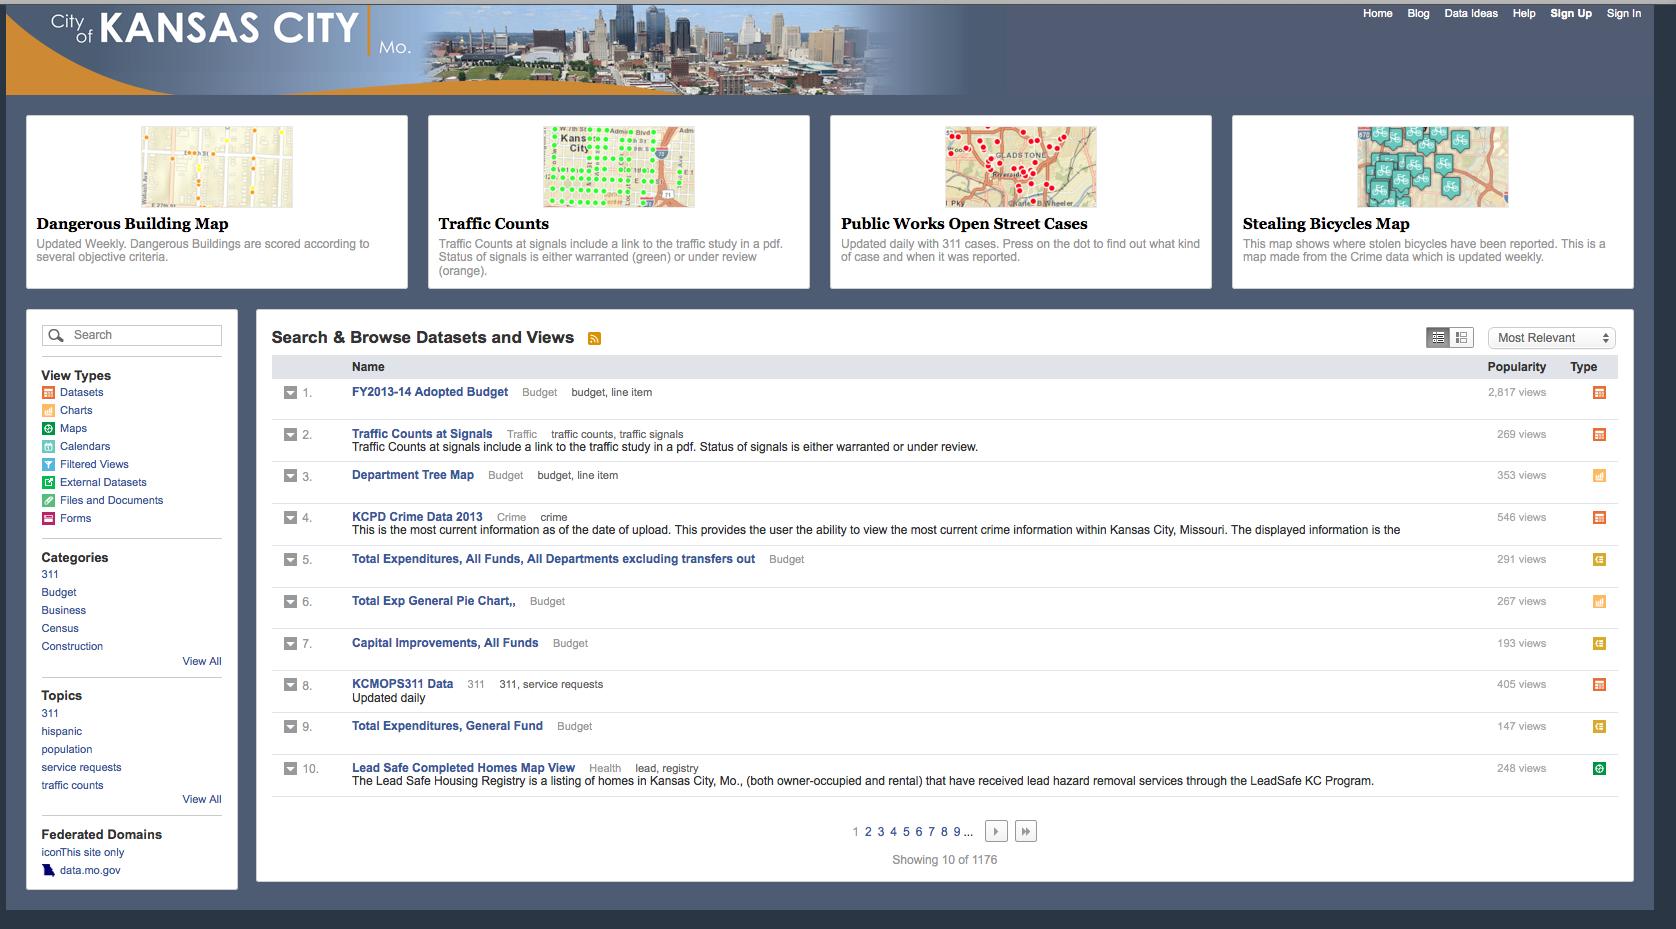 KCStat Dashboard displays data through a cross-browser, modual interface.